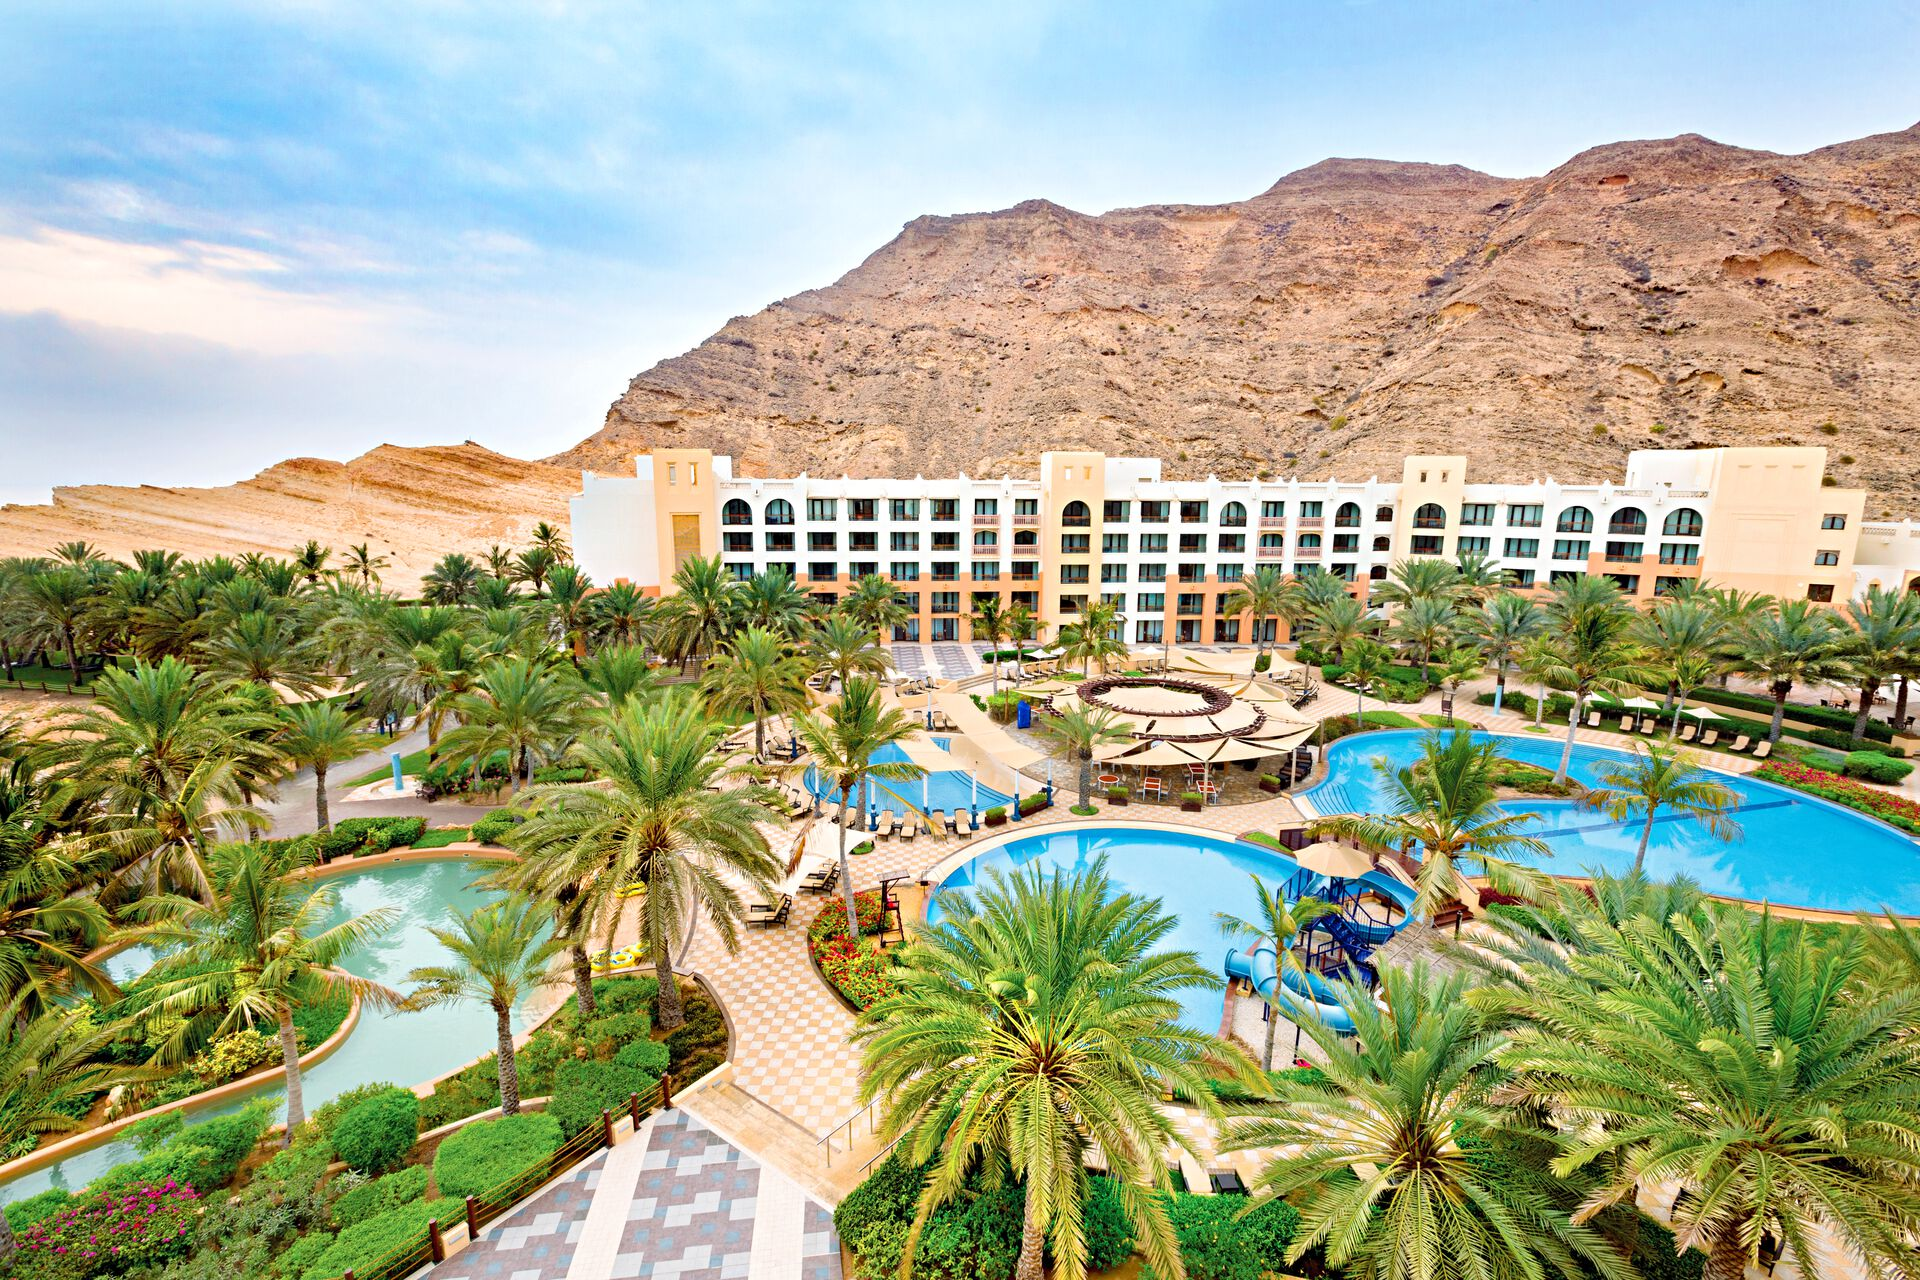 shangri-la barr al jissah resort & spa - al waha - 5*